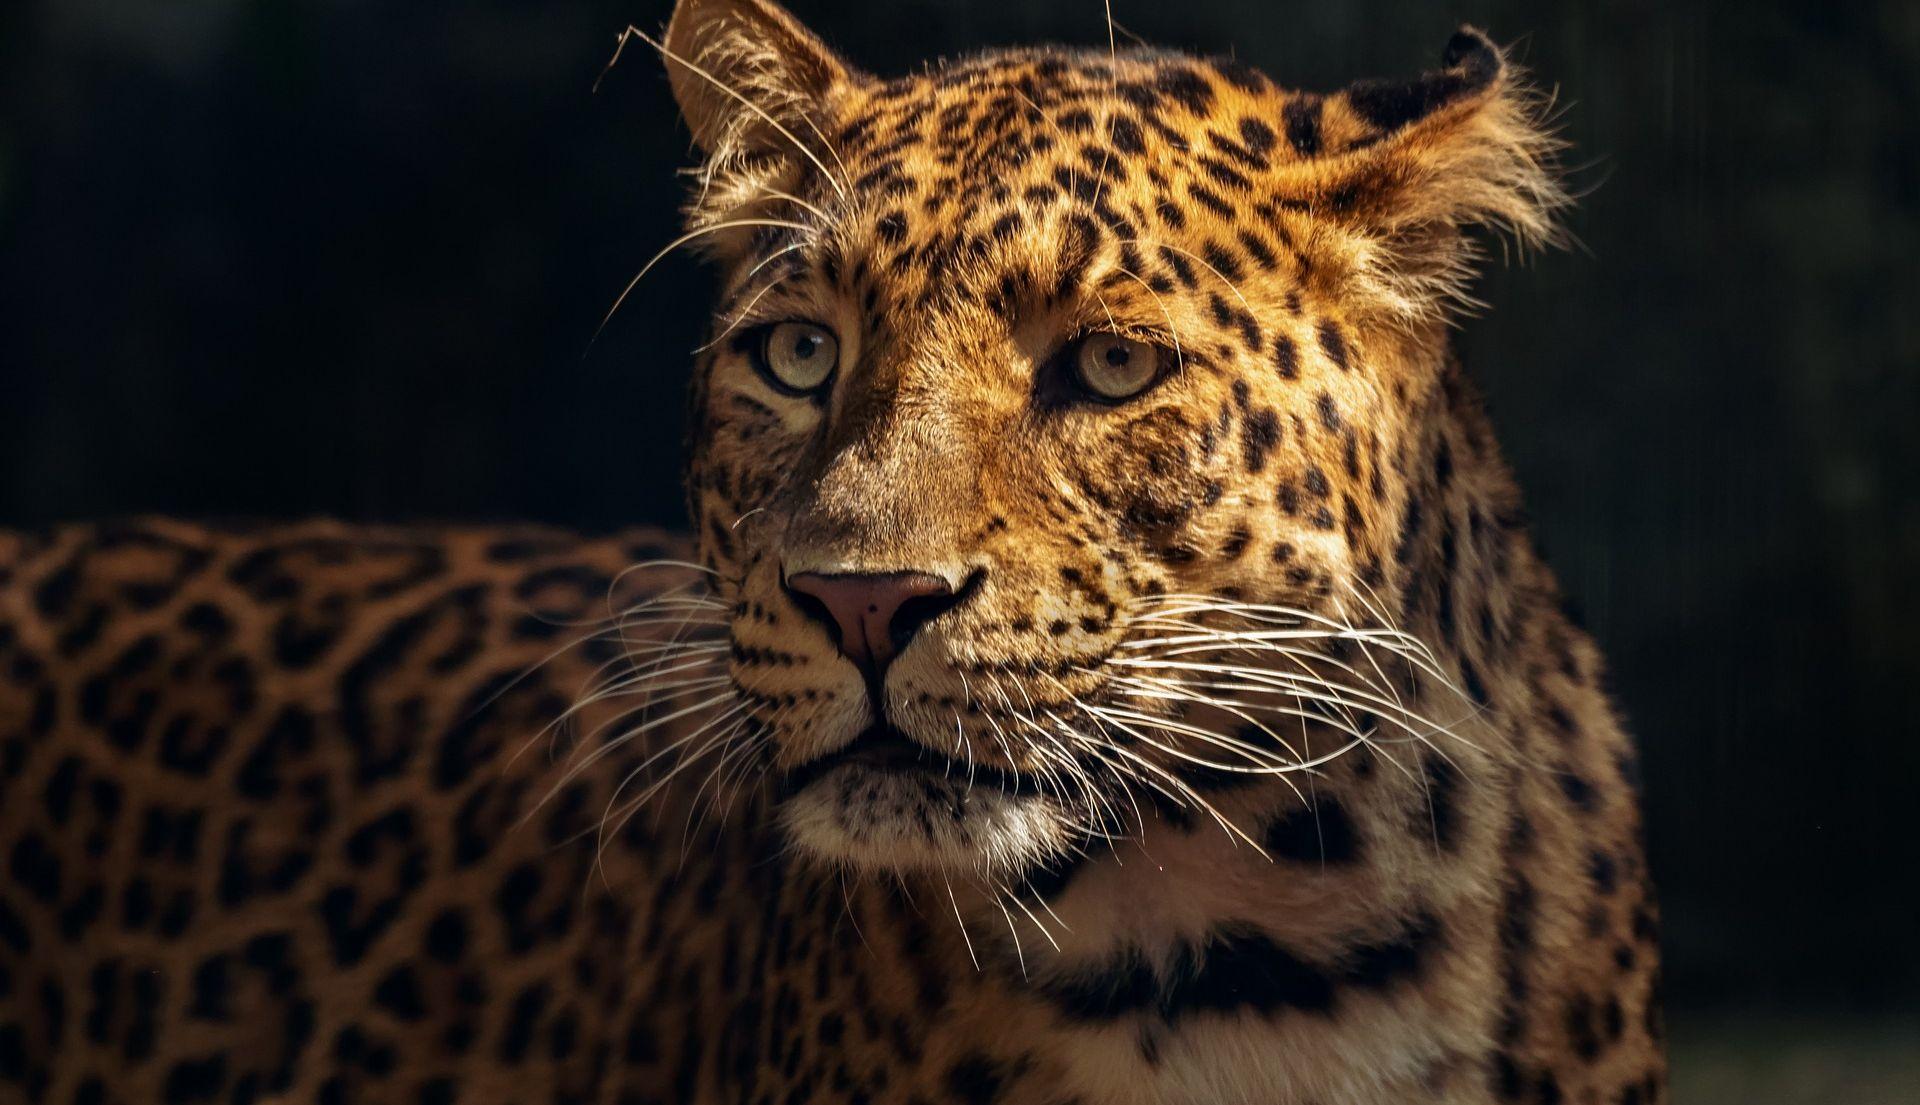 U Meksiku raste populacija jaguara